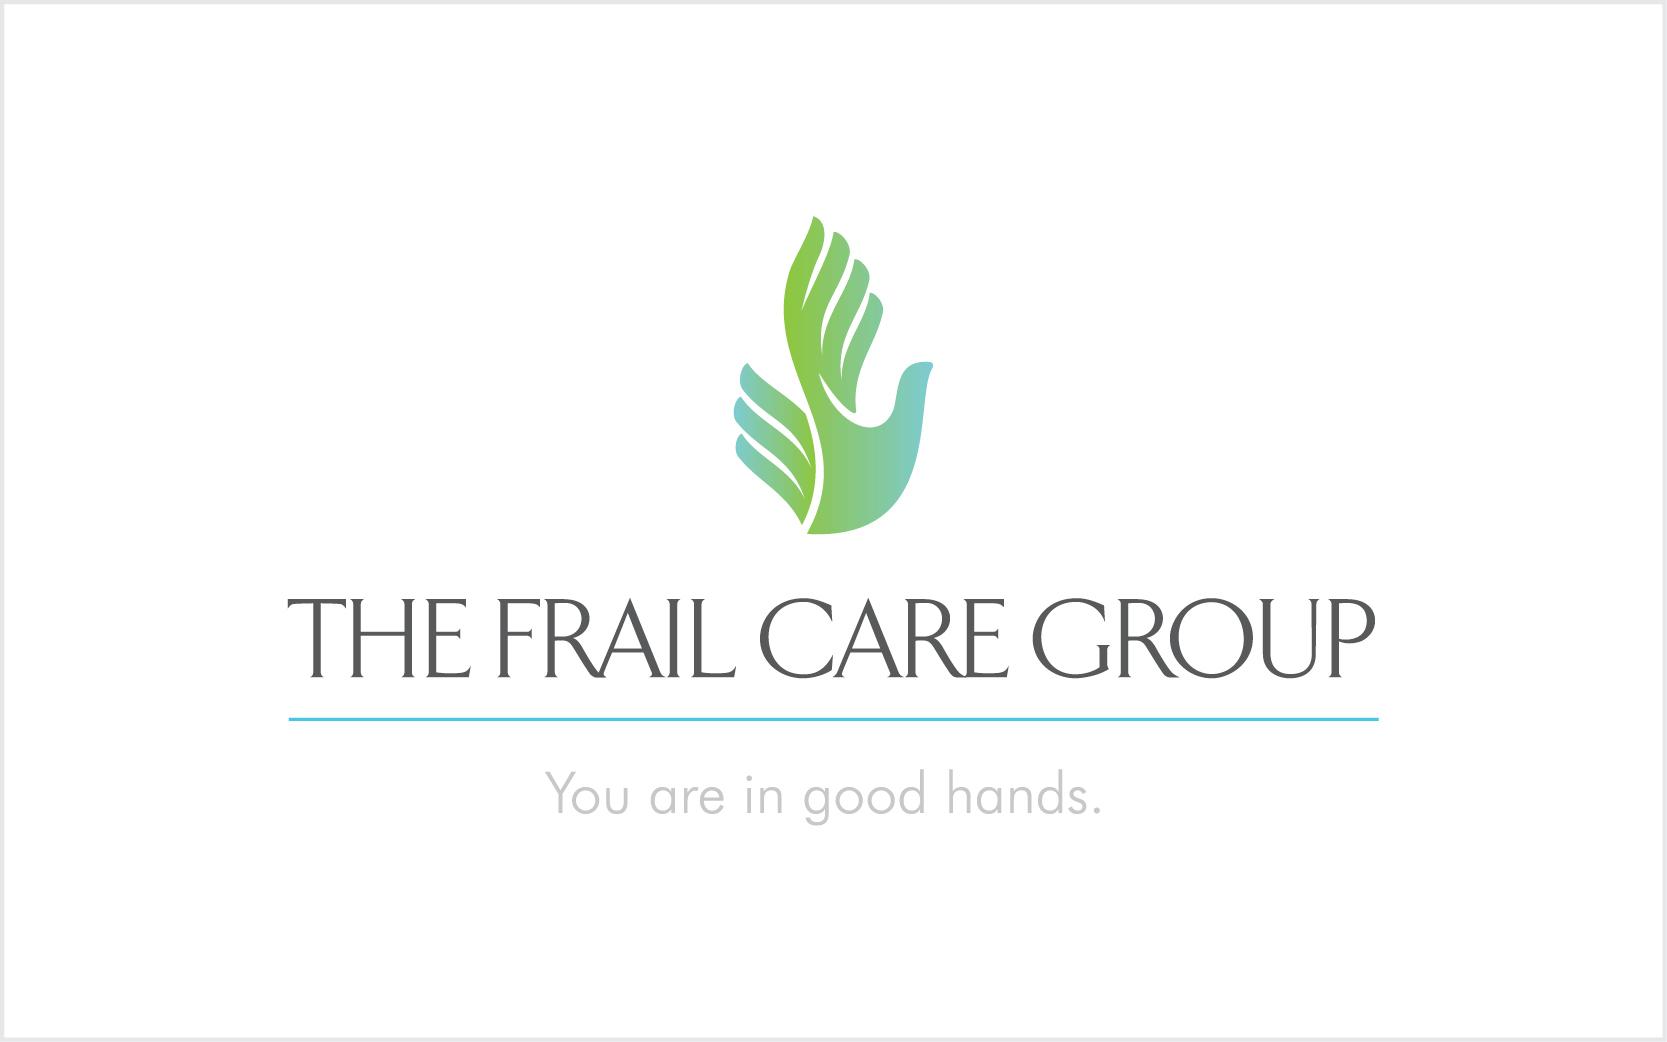 The Frail Care Group logo